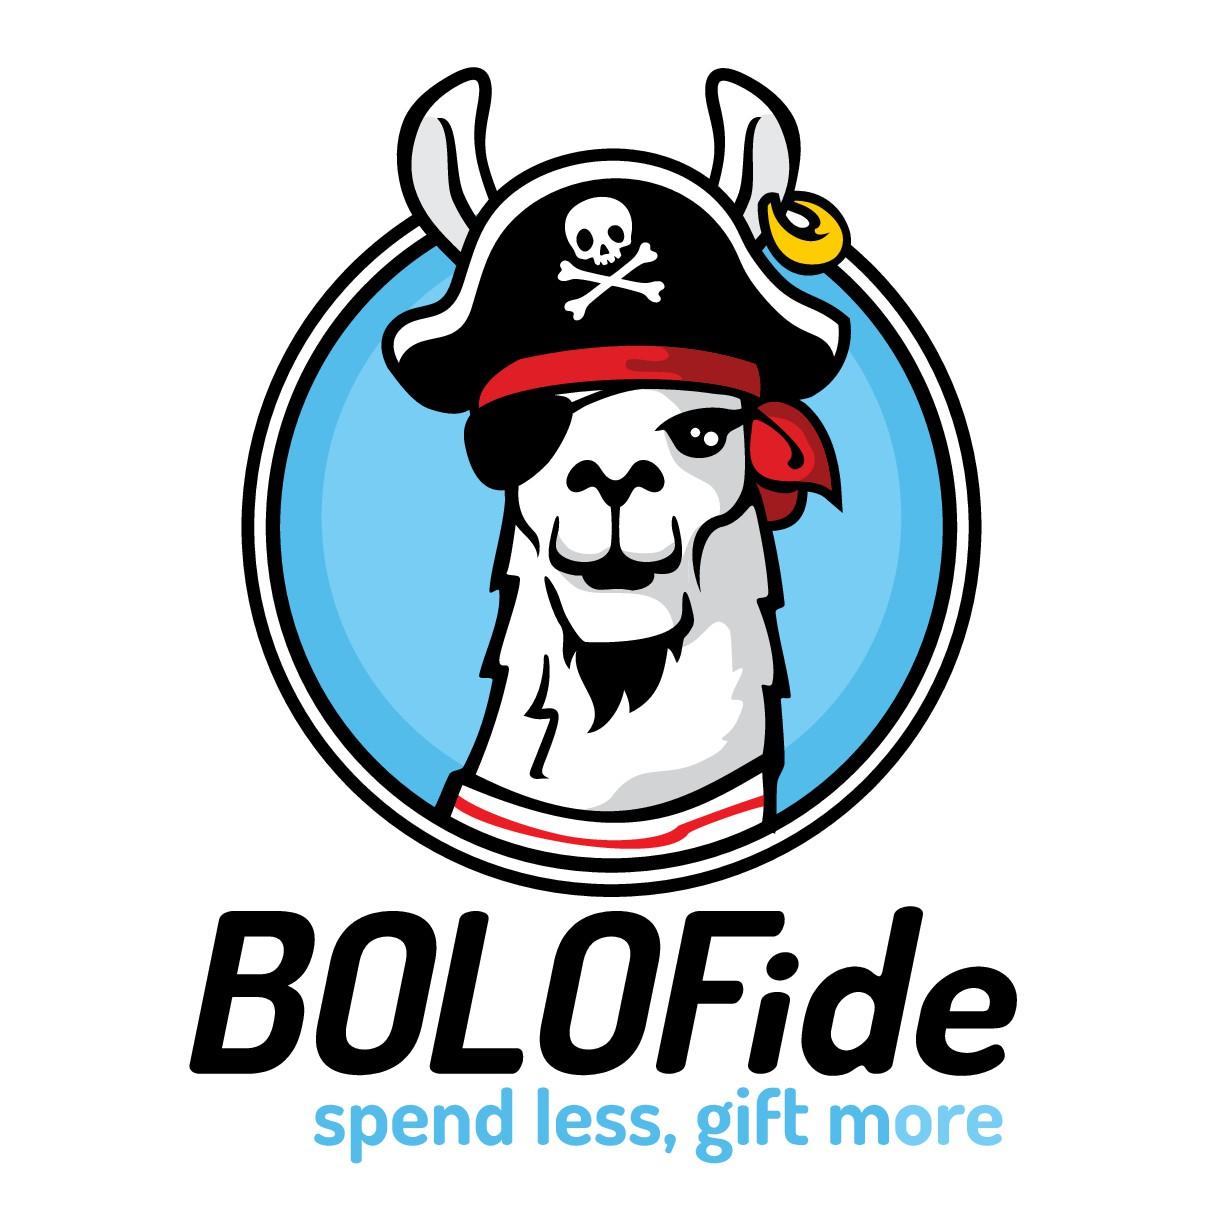 Llama Pirate Logo for Retail Business